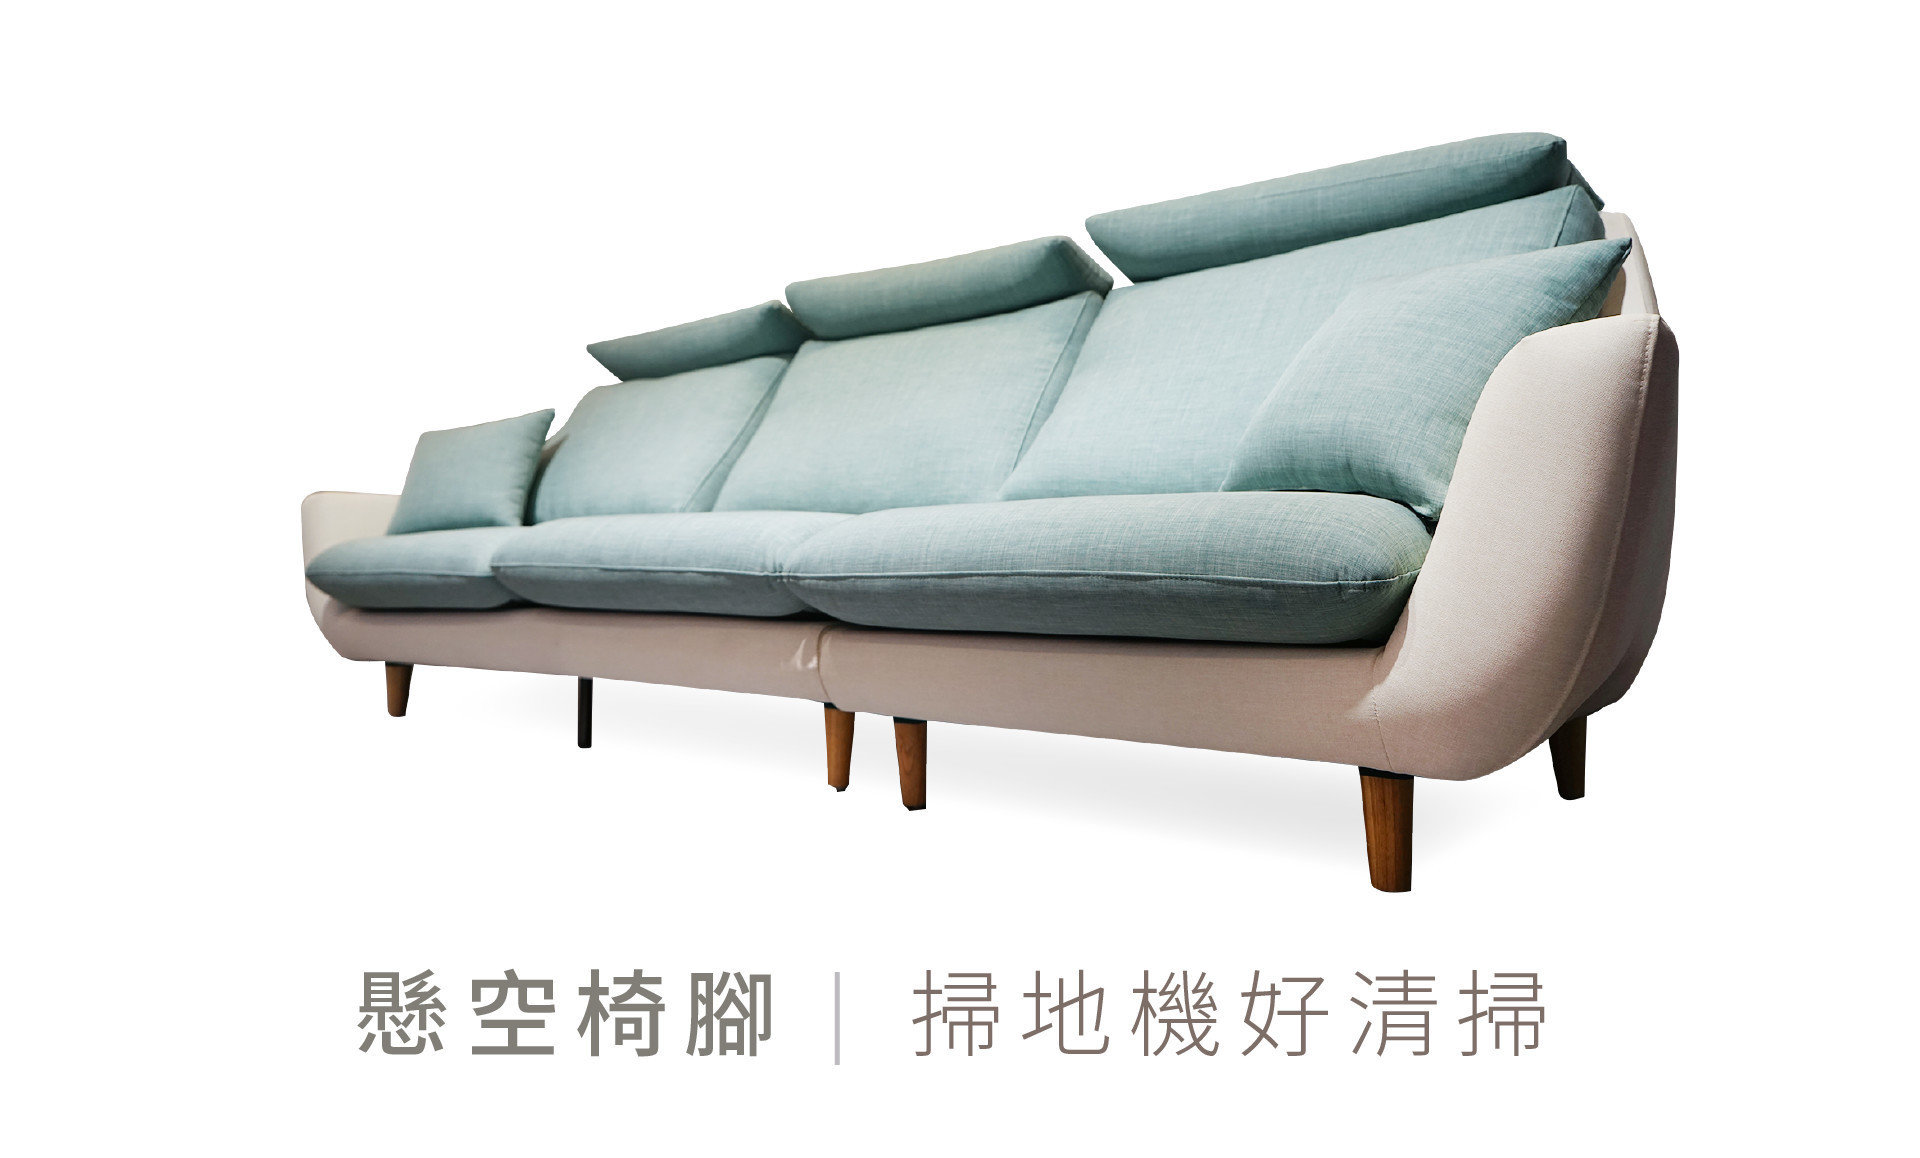 【Ariel愛麗兒沙發】採懸空椅腳,更好清掃,沙發底部不怕積塵!